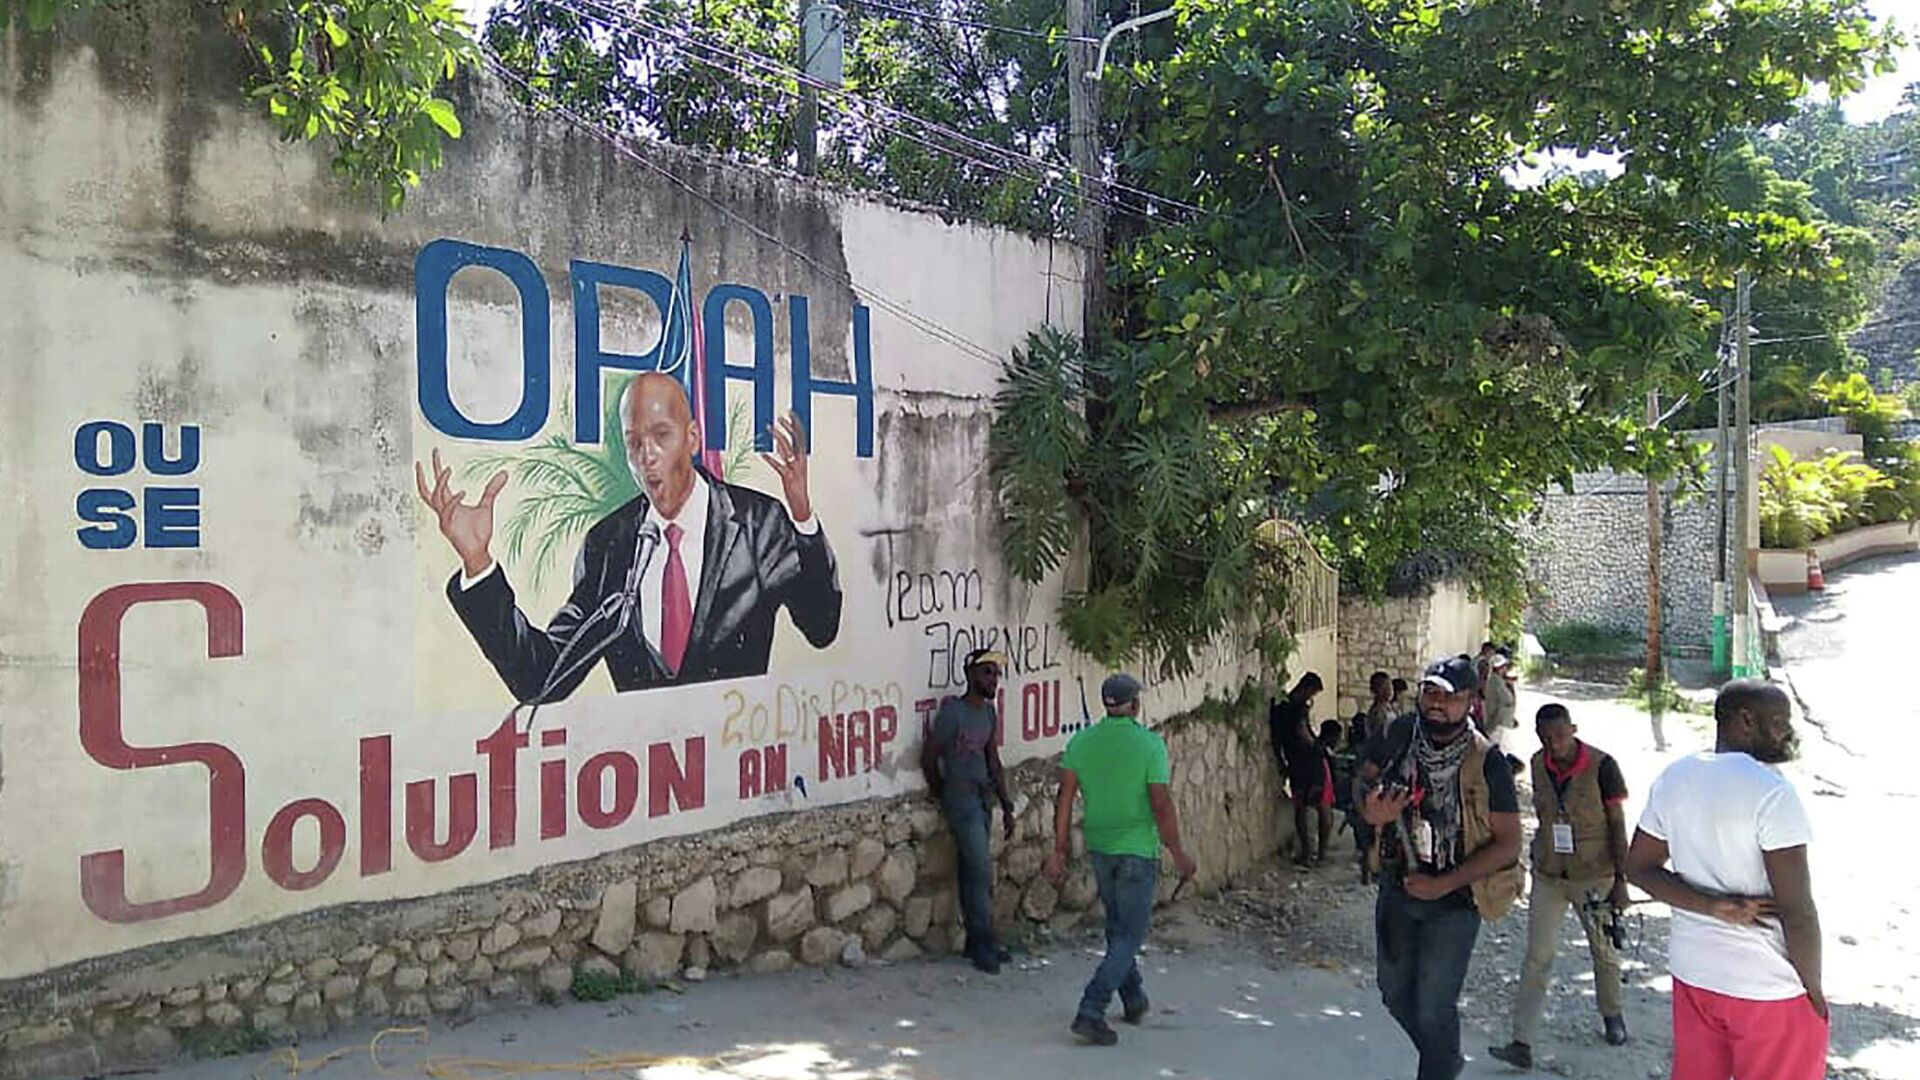 Mural con el presidente de Haití Jovenel Moise, asesinado el 7 de julio - Sputnik Mundo, 1920, 08.07.2021